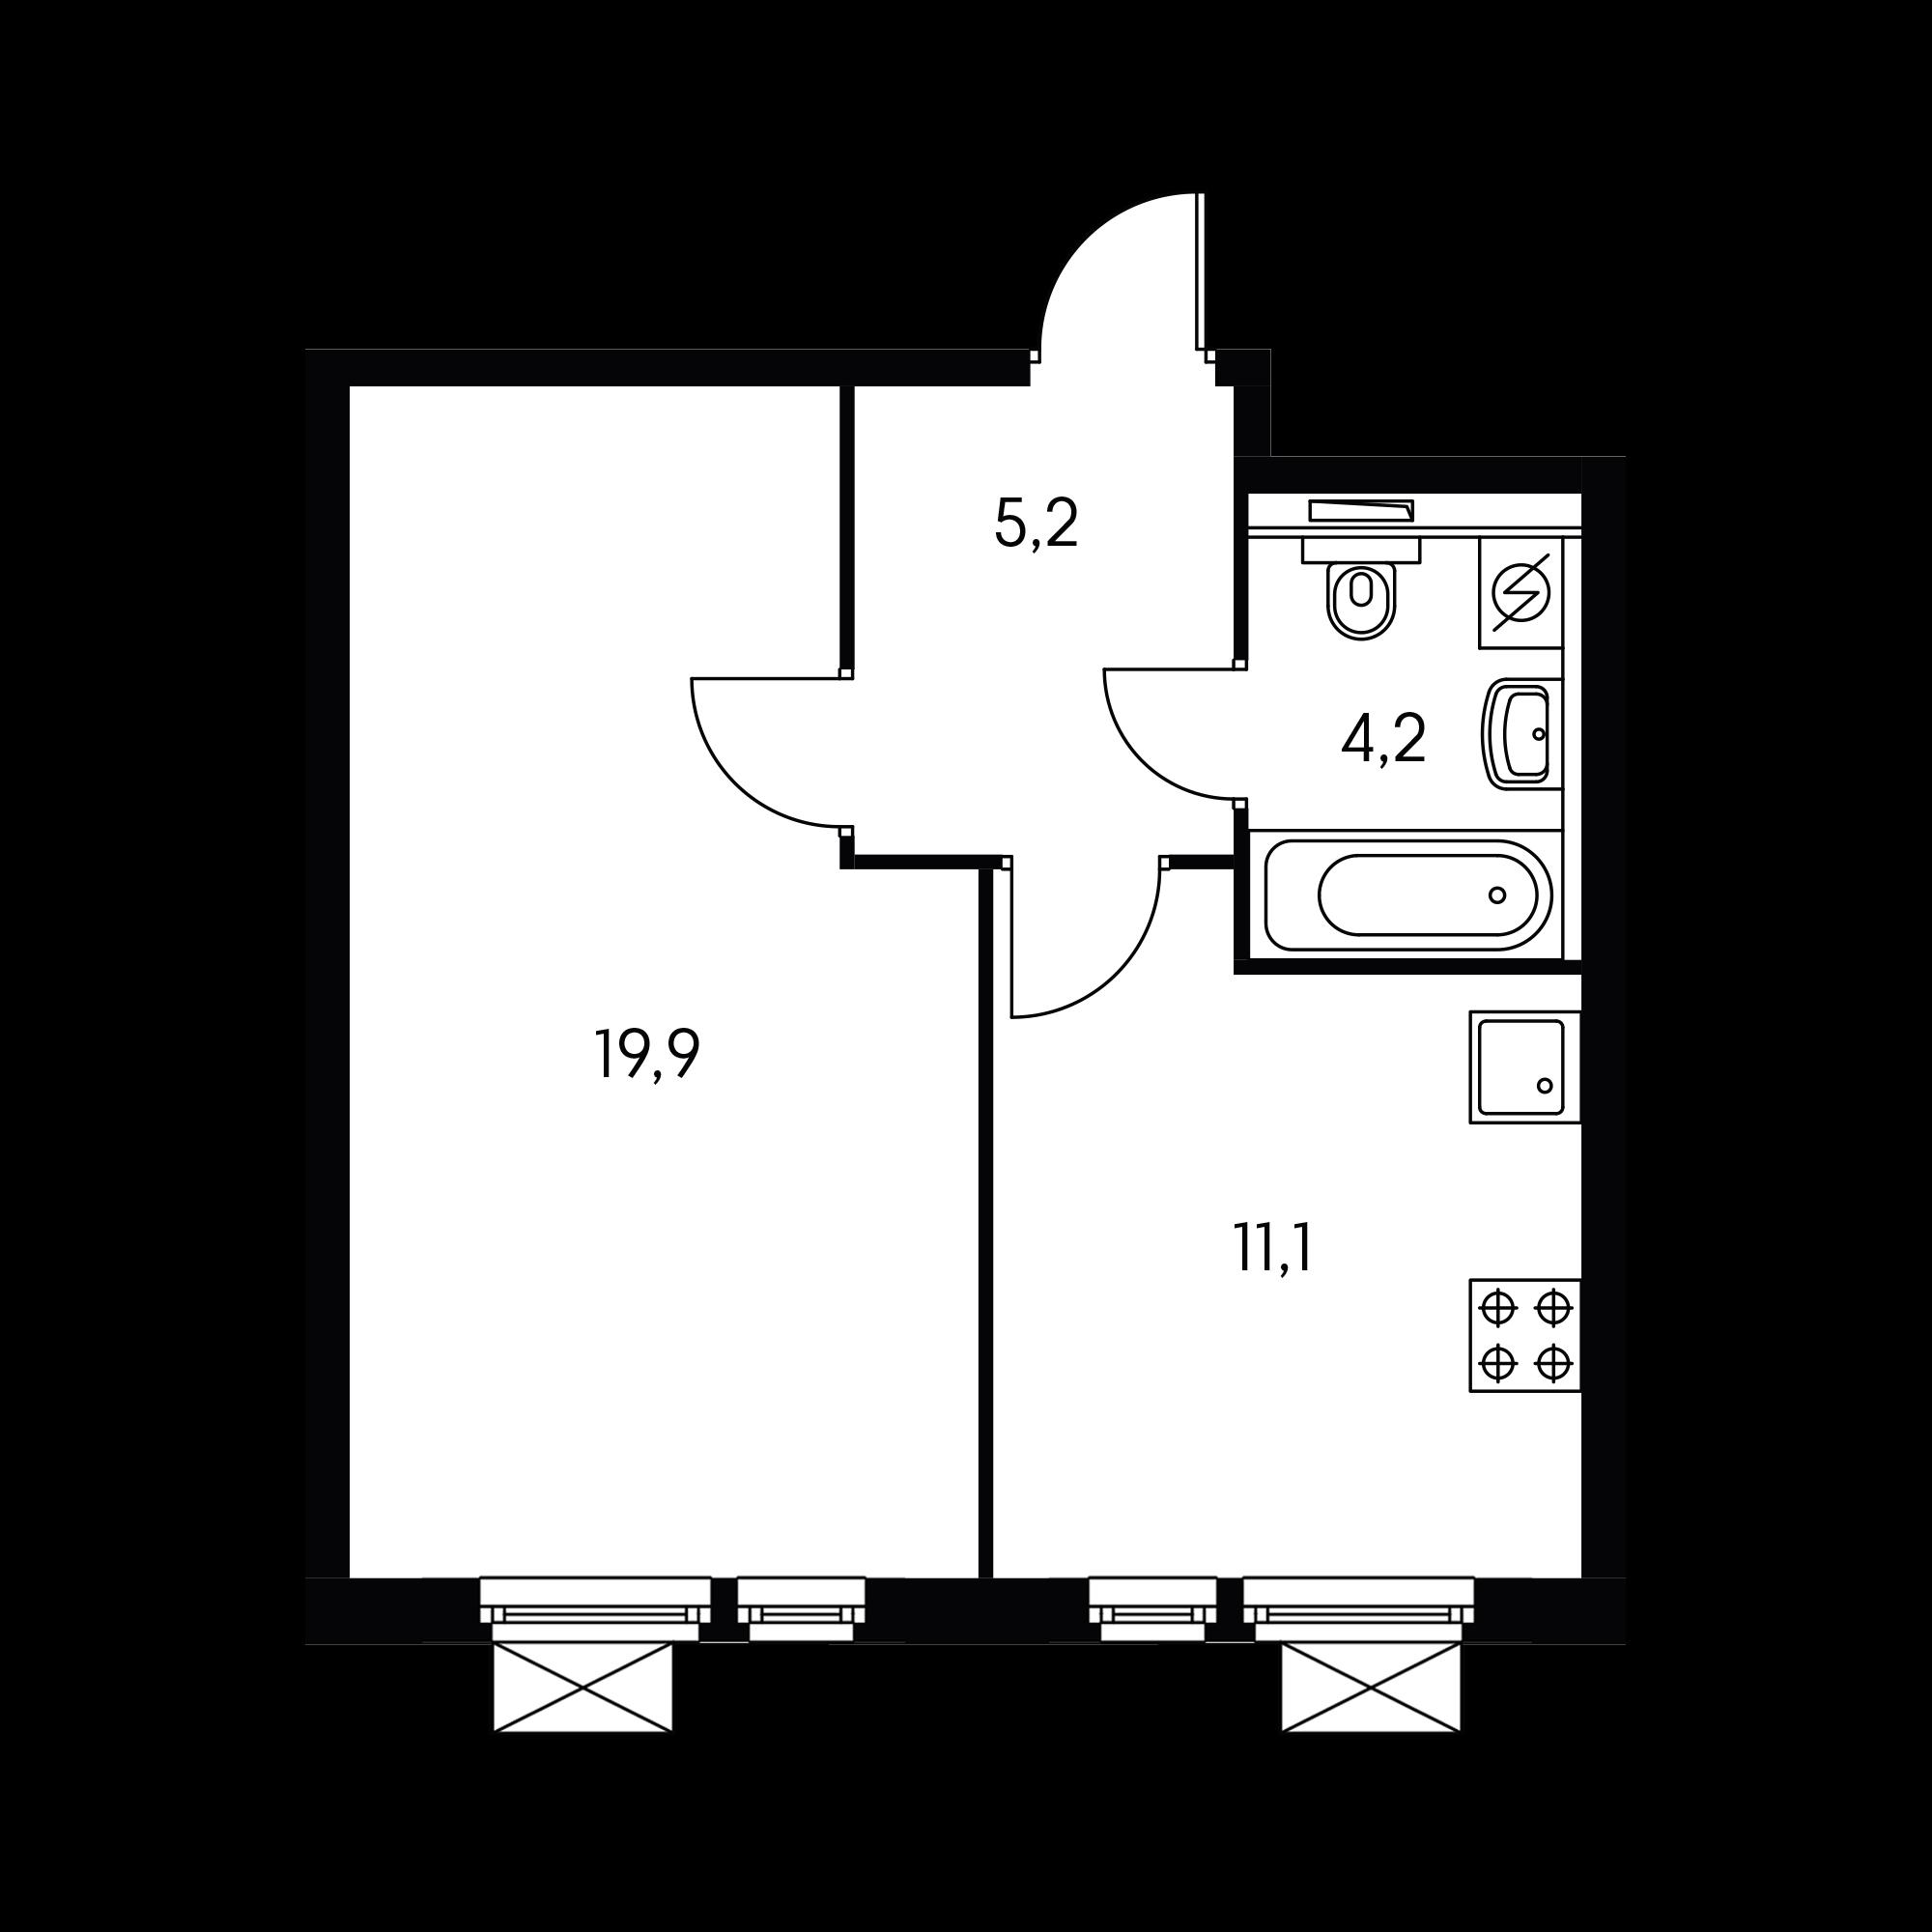 1KM1_6.9-3